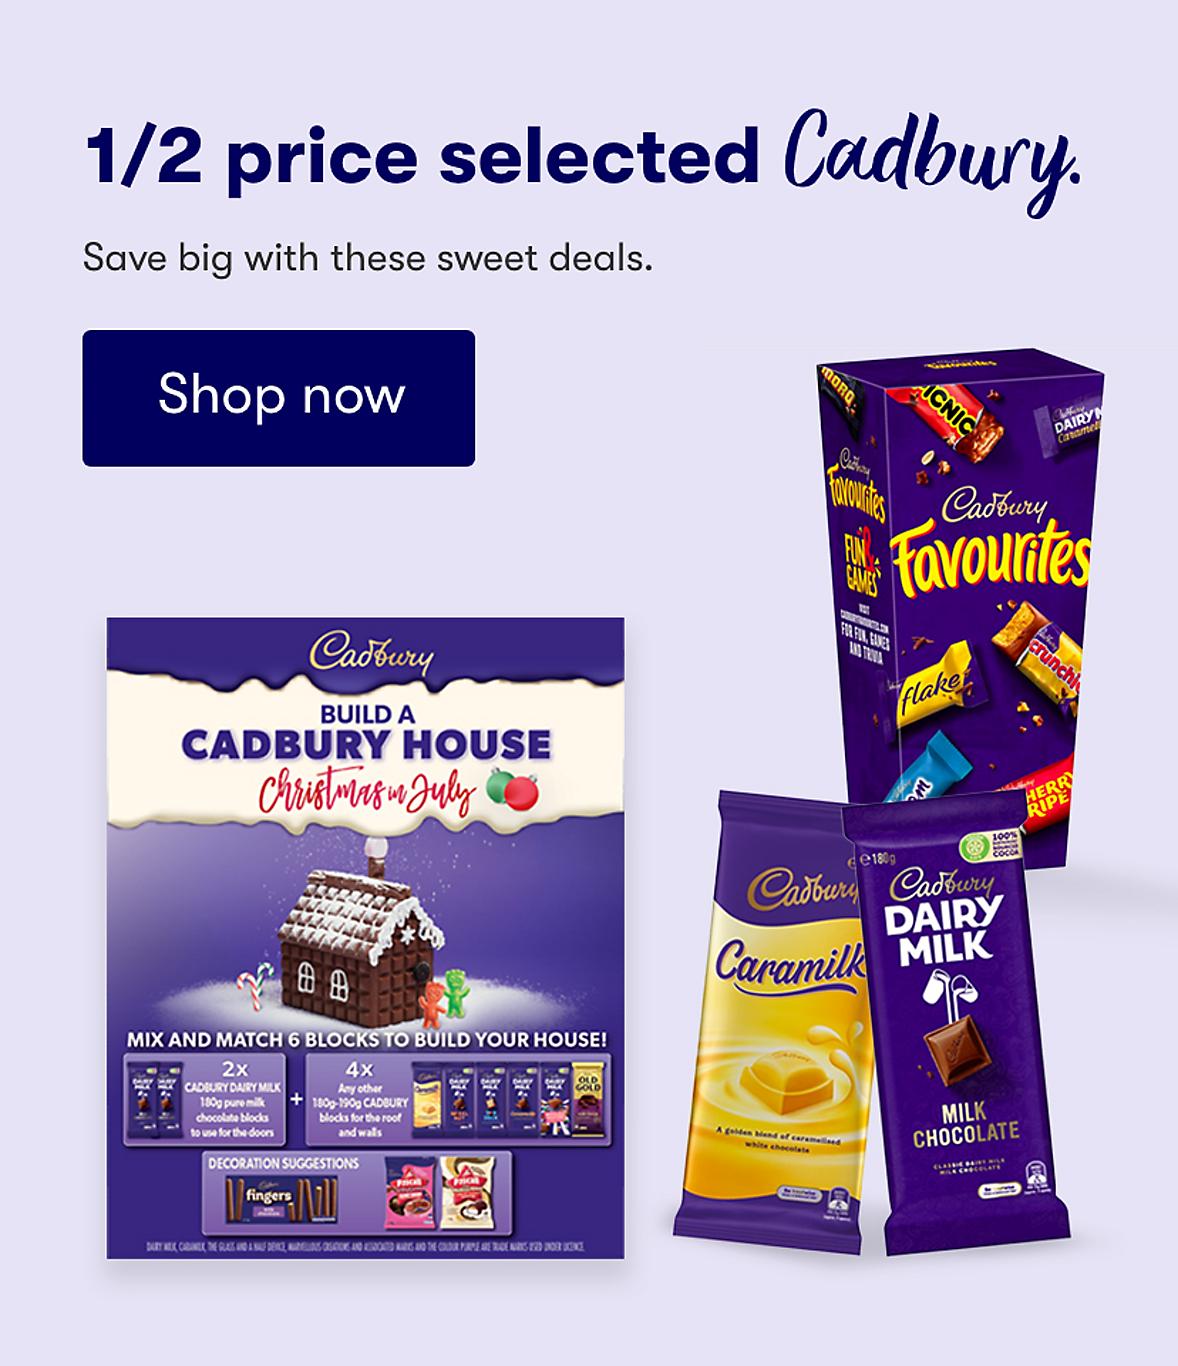 1/2 price selected Cadbury